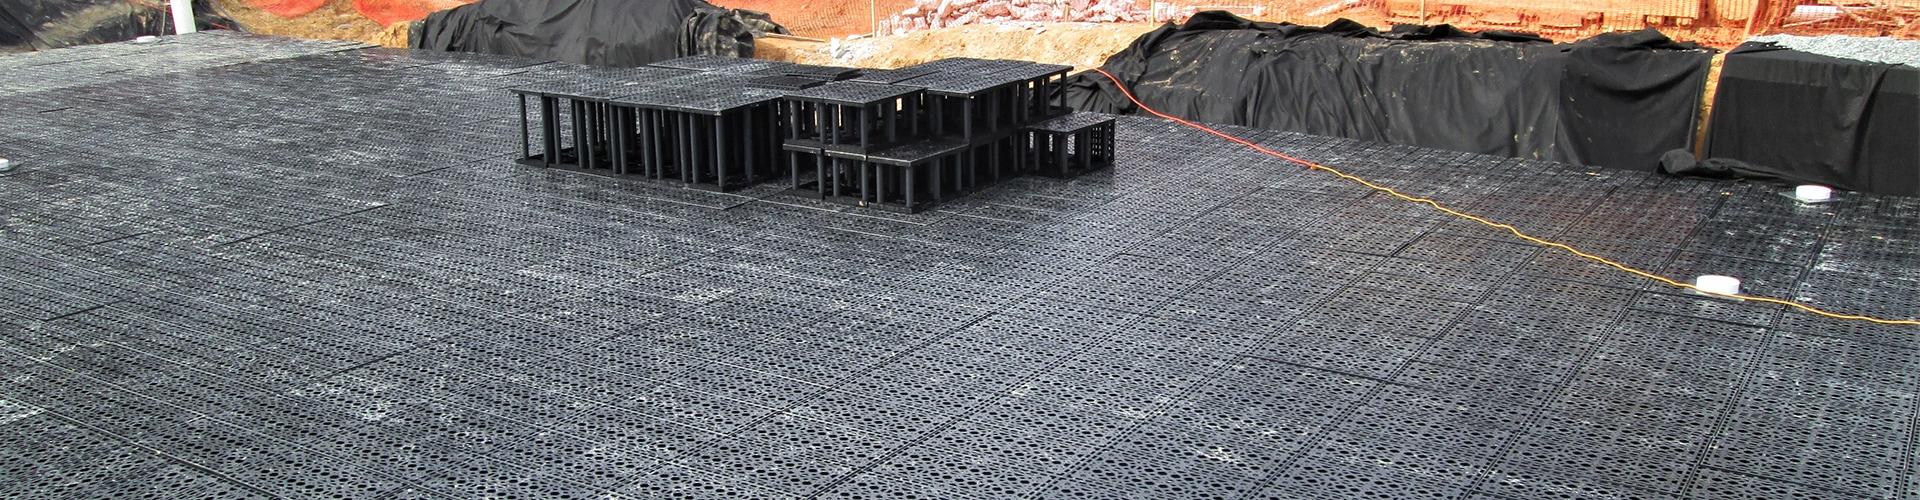 StormTank Module during construction